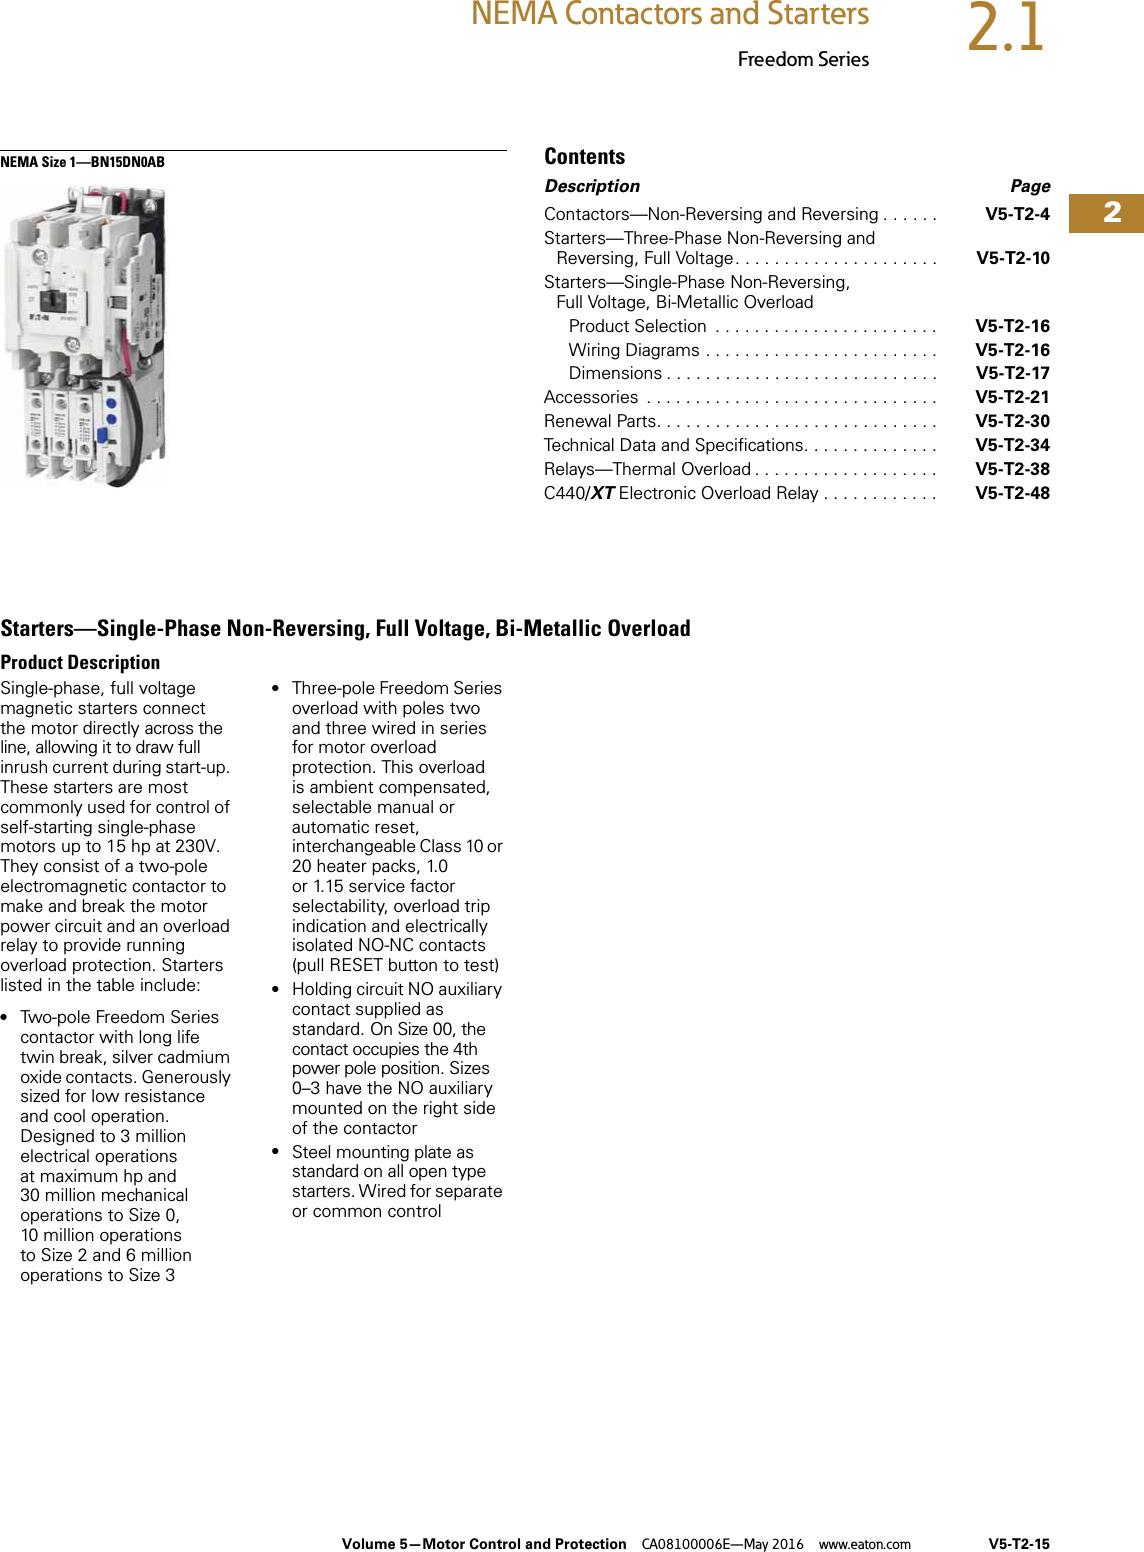 1000368593 Catalog on